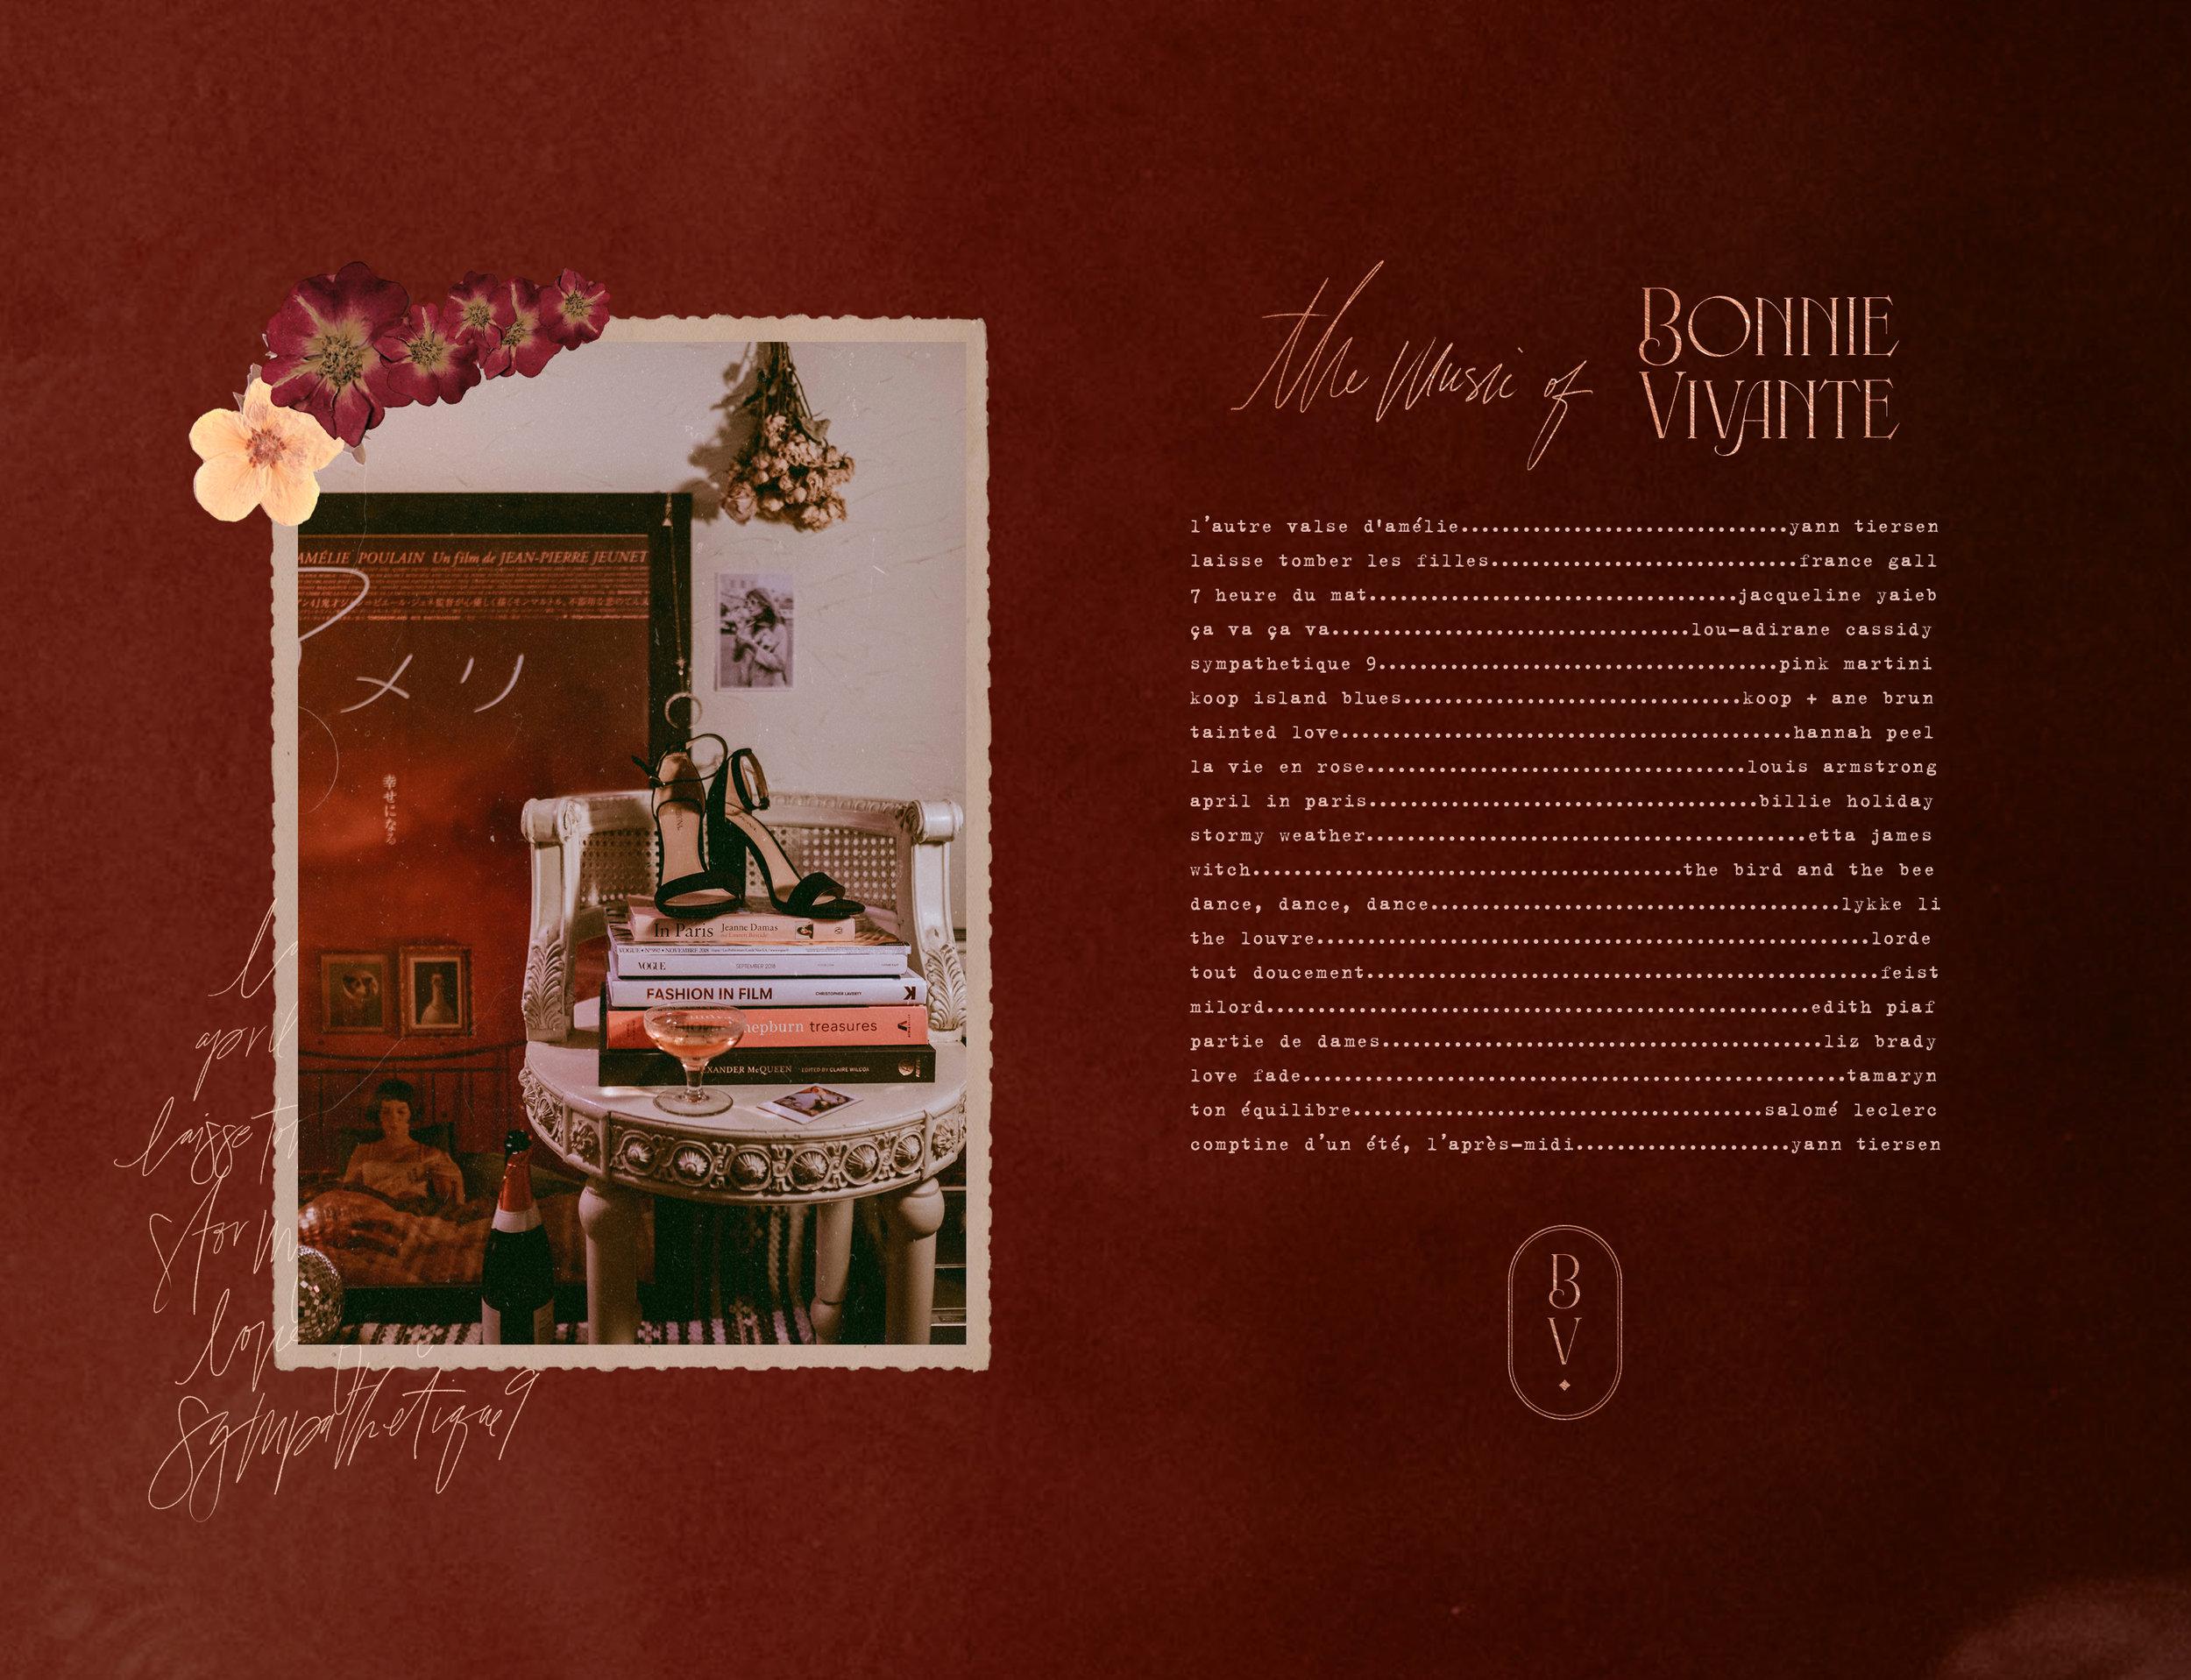 bv-playlist-tracks.jpg